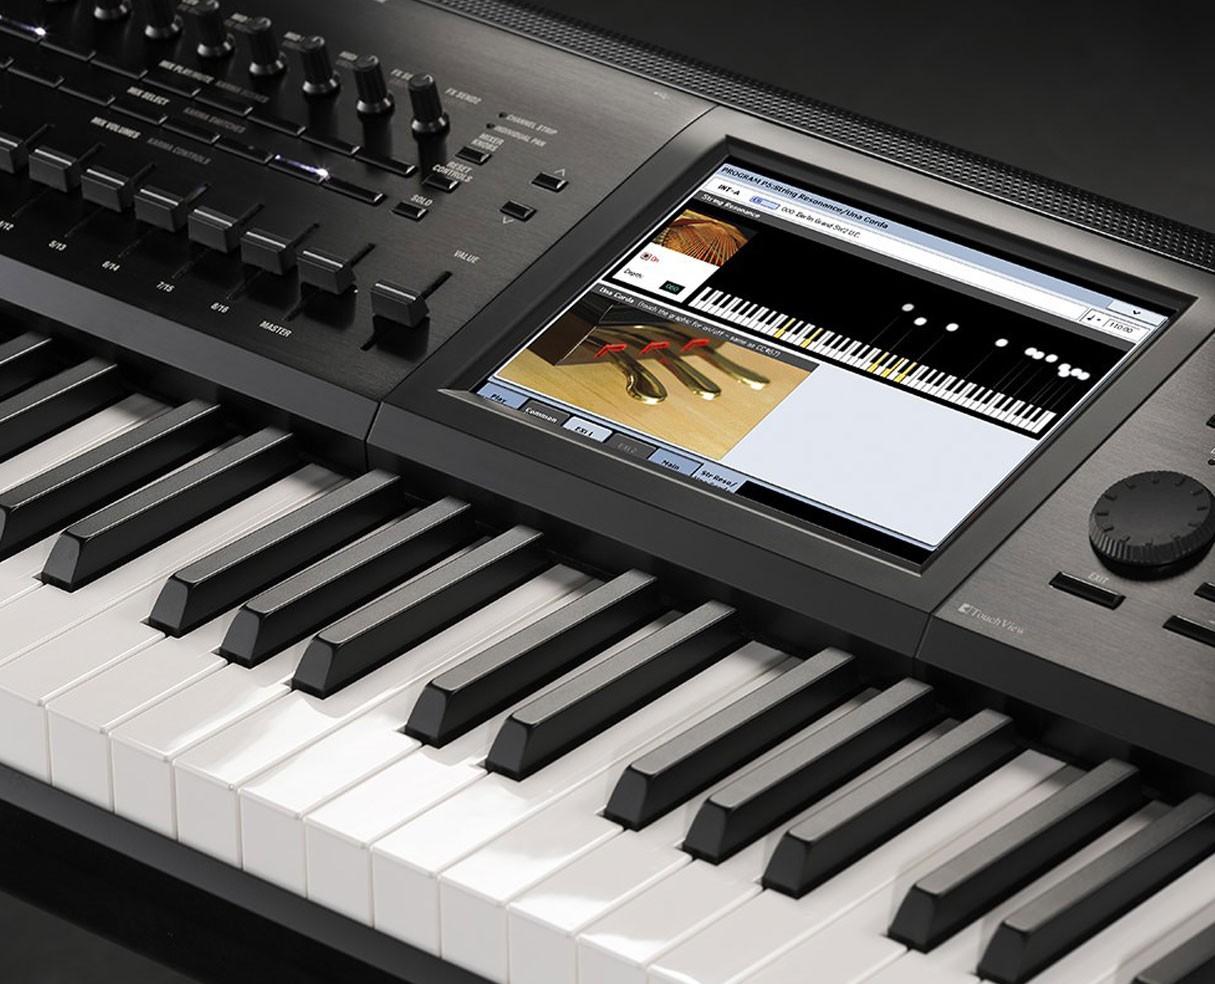 Musician Keyboard Workstations : korg kronos 2 73 key synthesizer workstation keyboard ~ Russianpoet.info Haus und Dekorationen